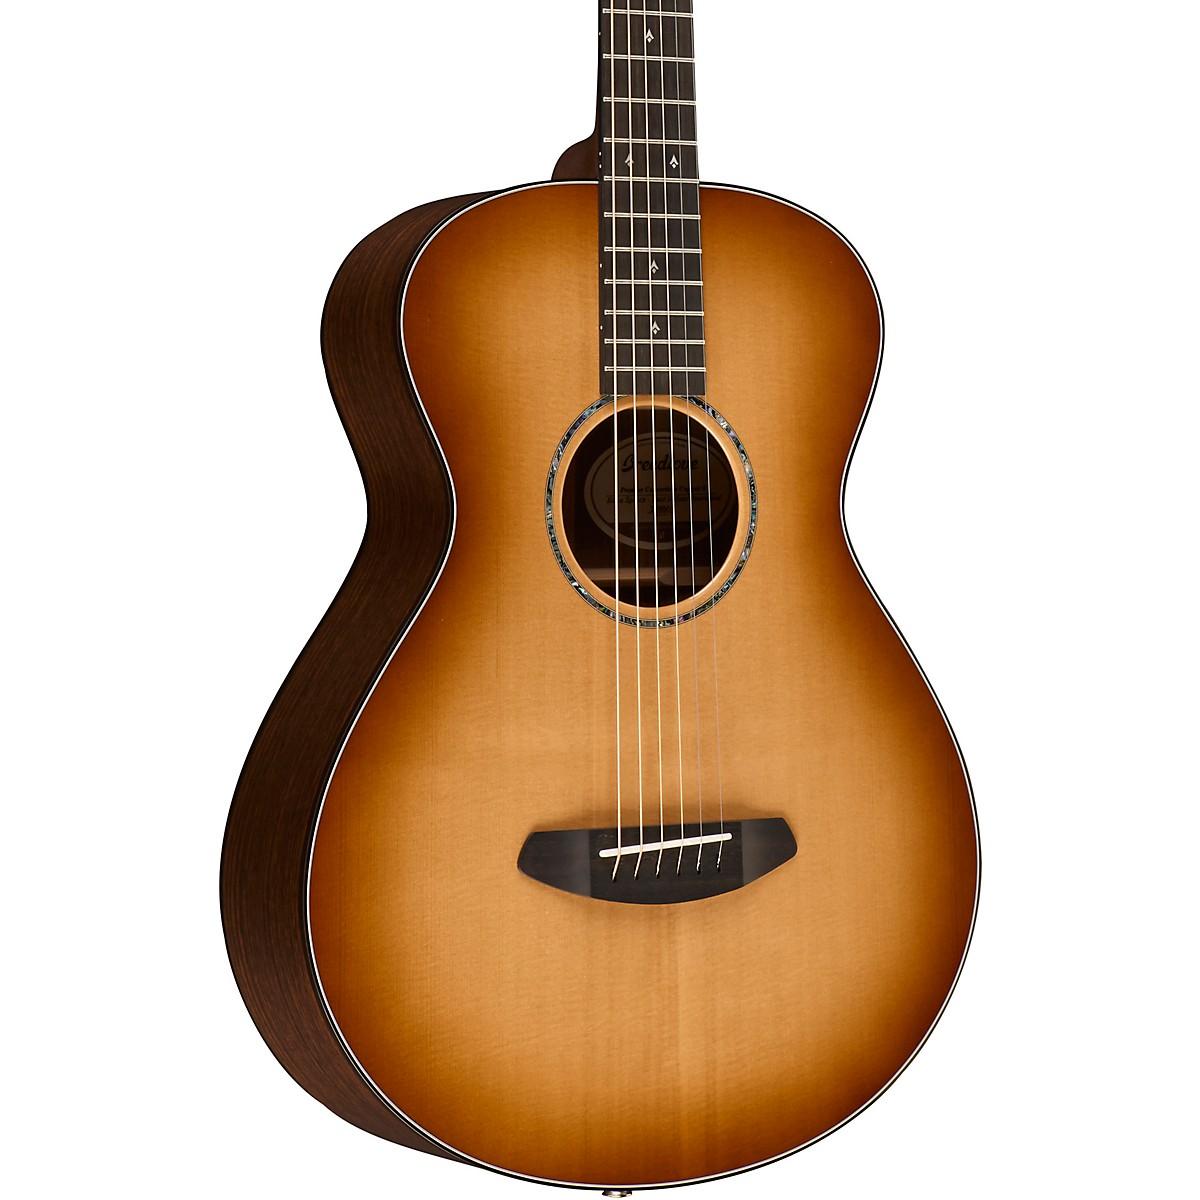 Breedlove Premier Concertina Acoustic-Electric Guitar